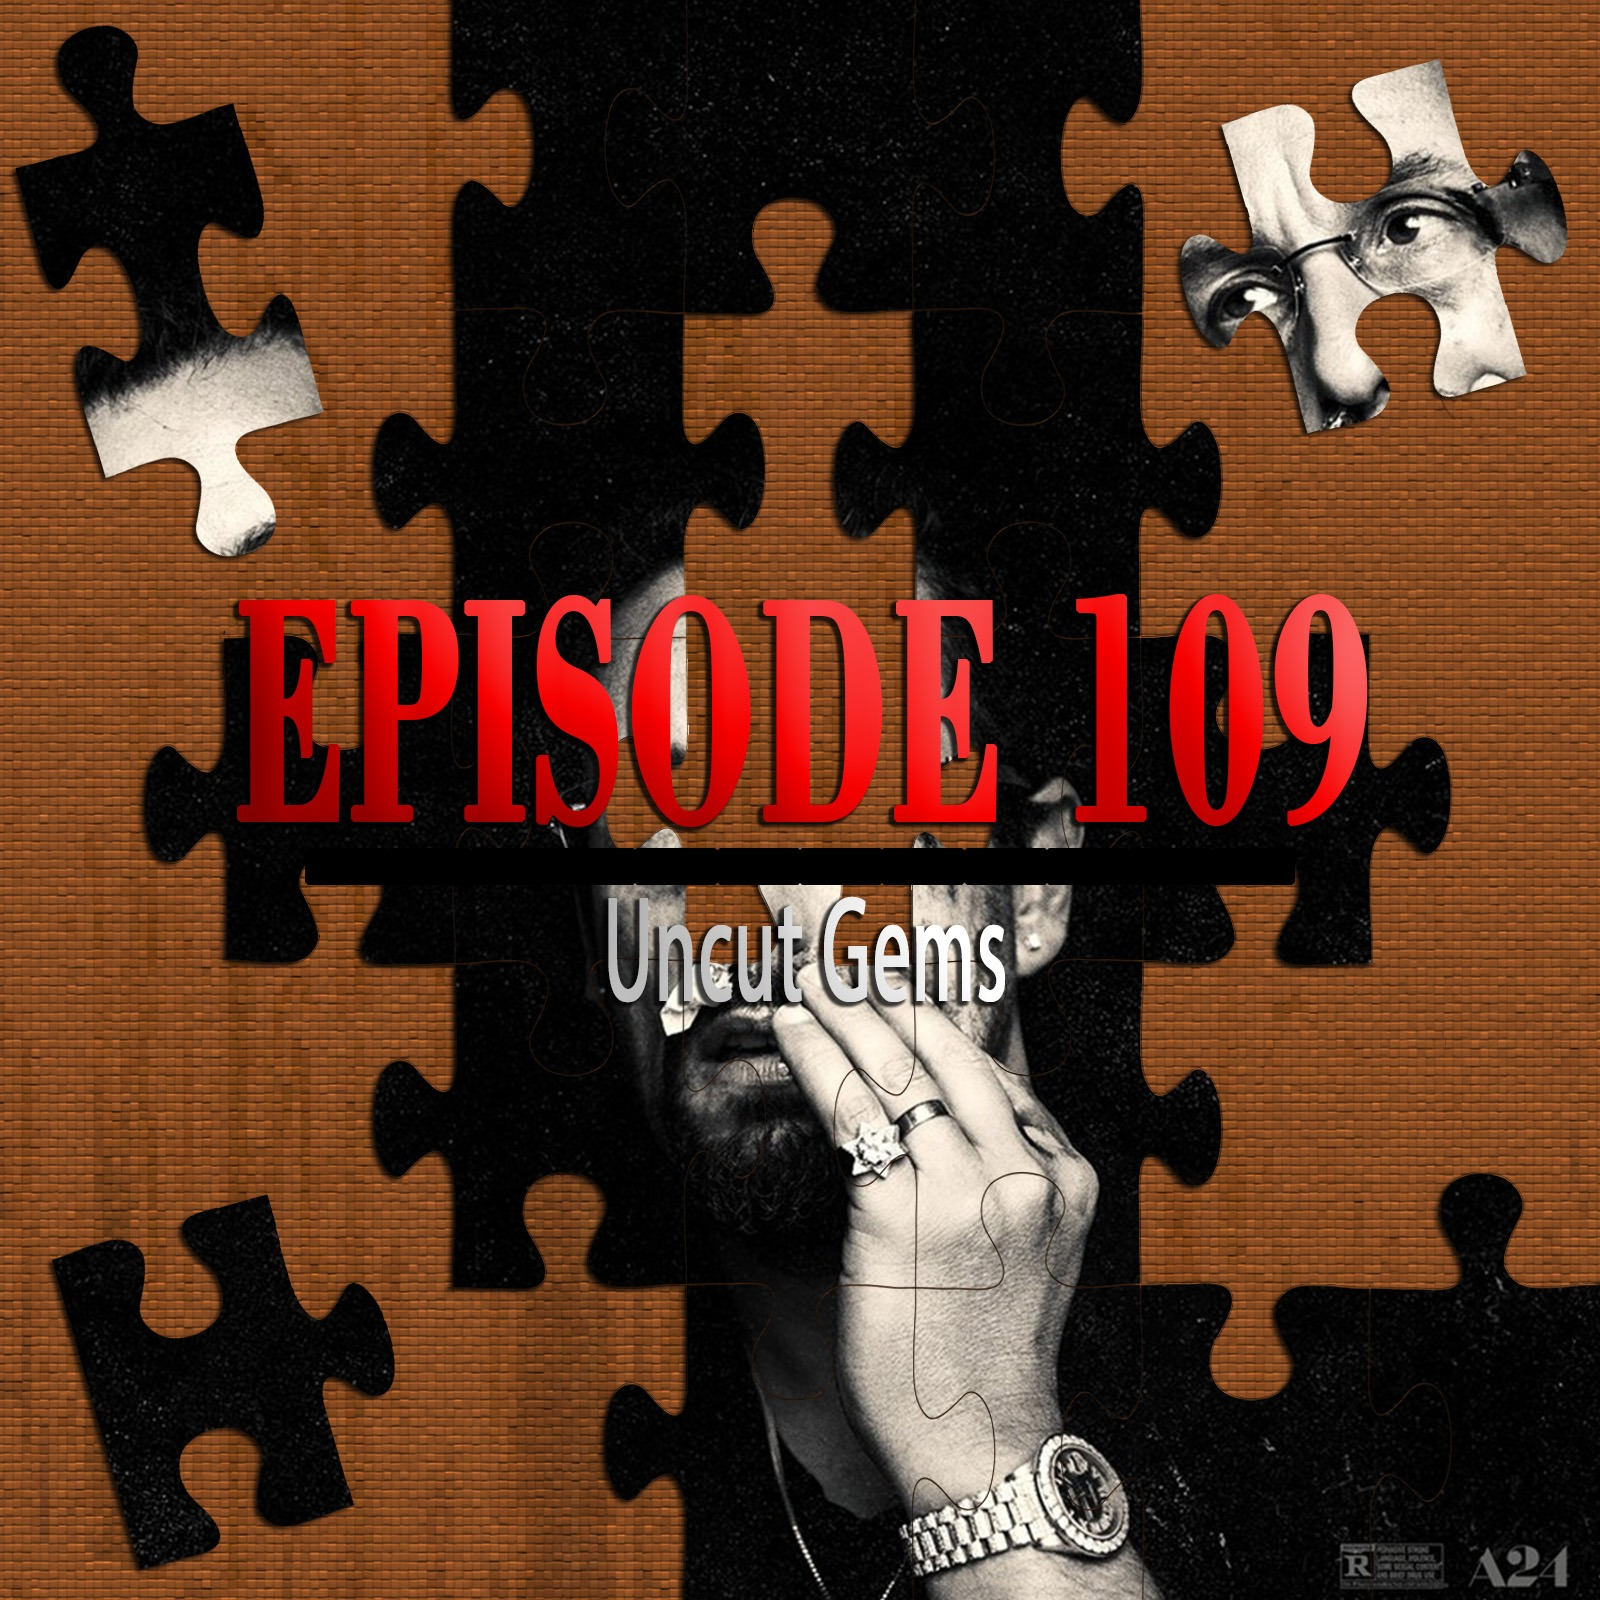 Uncut Gems (Featuring Kris Krainock)